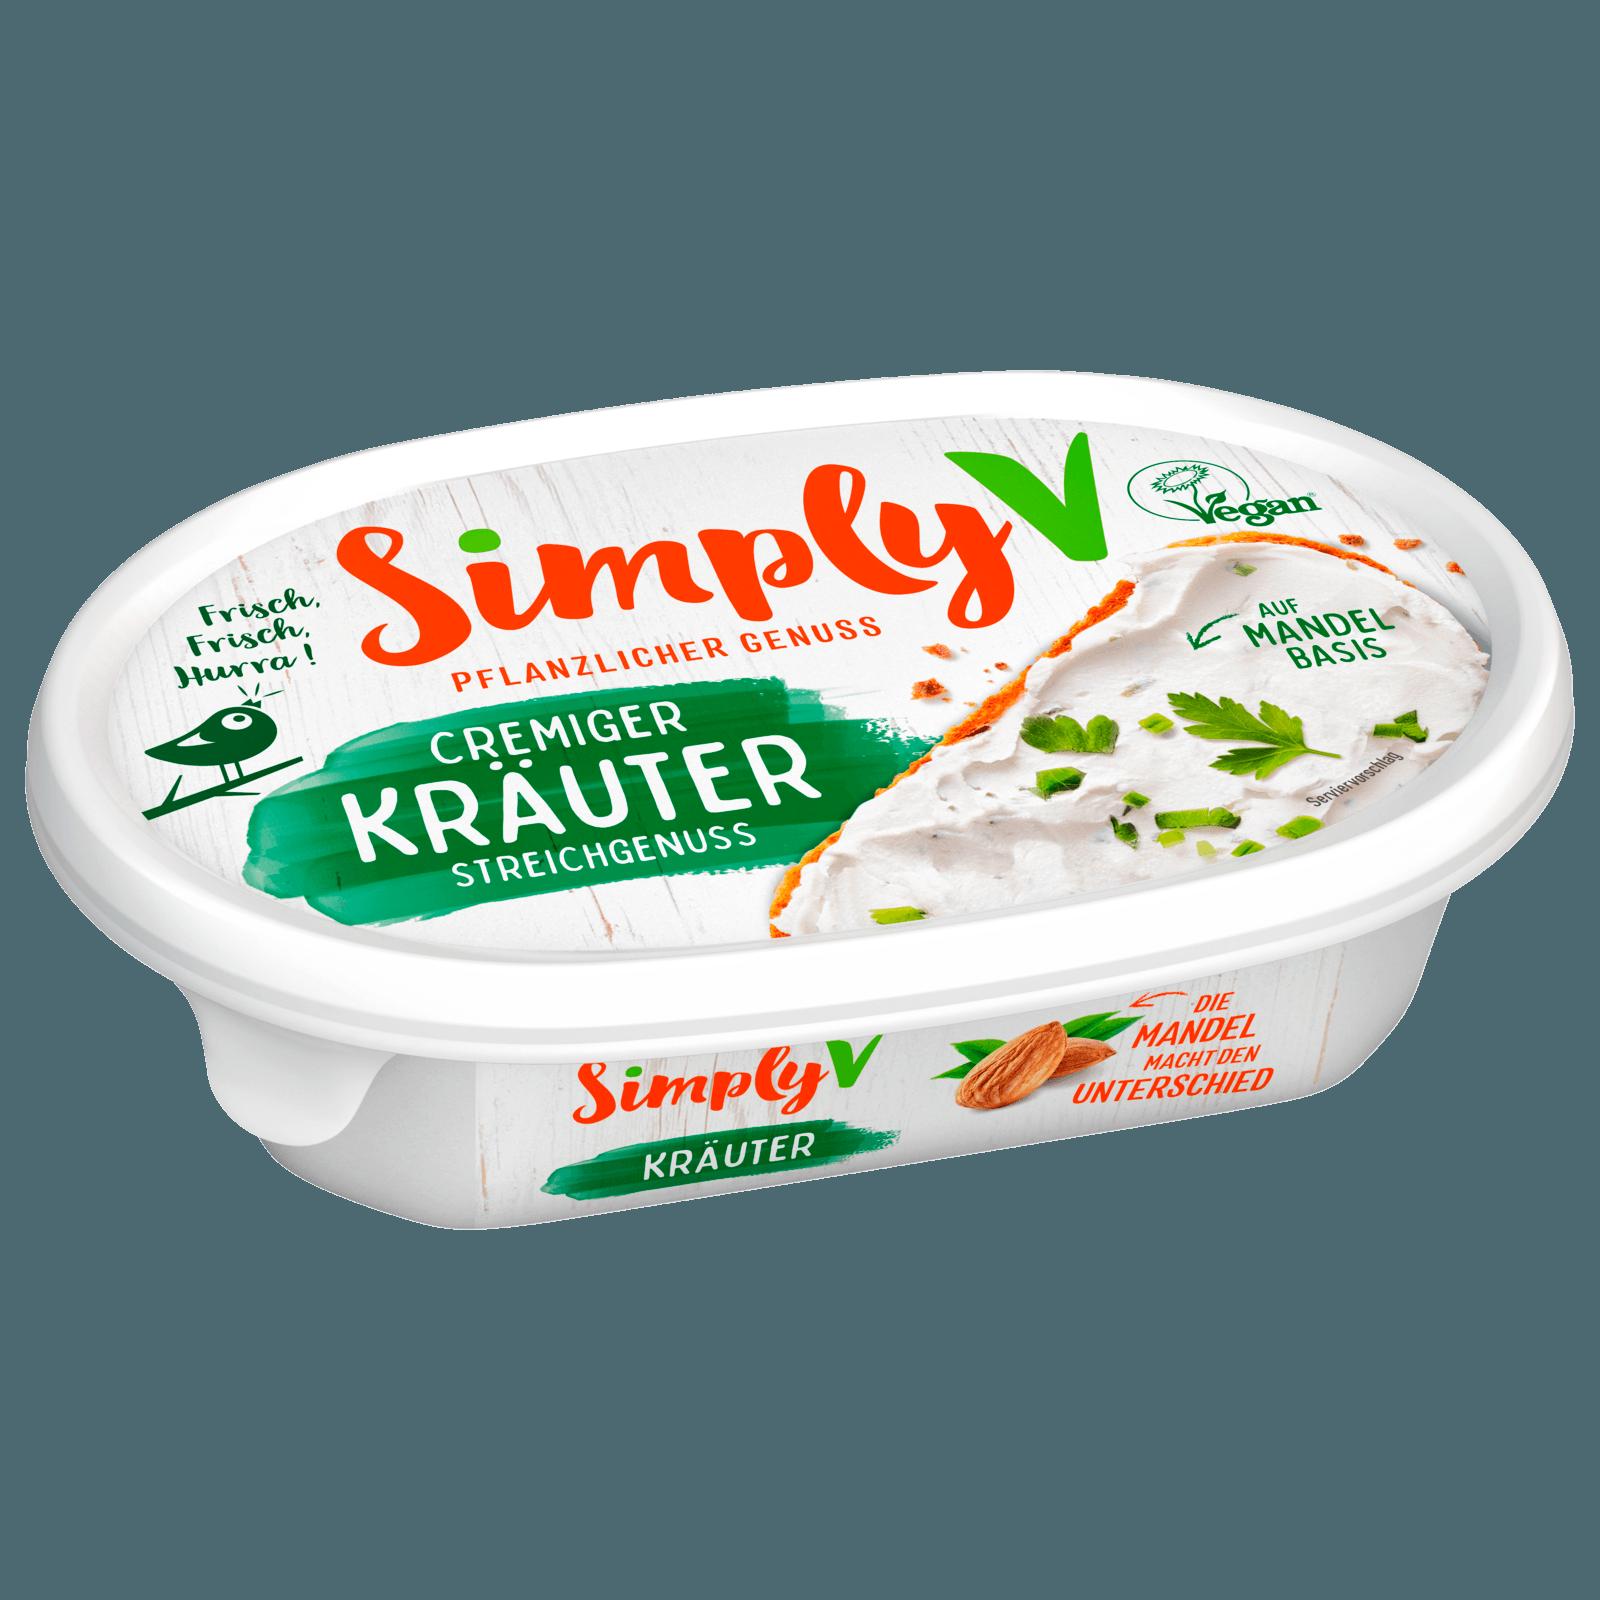 Simply V Streichgenuss Kräuter 150g